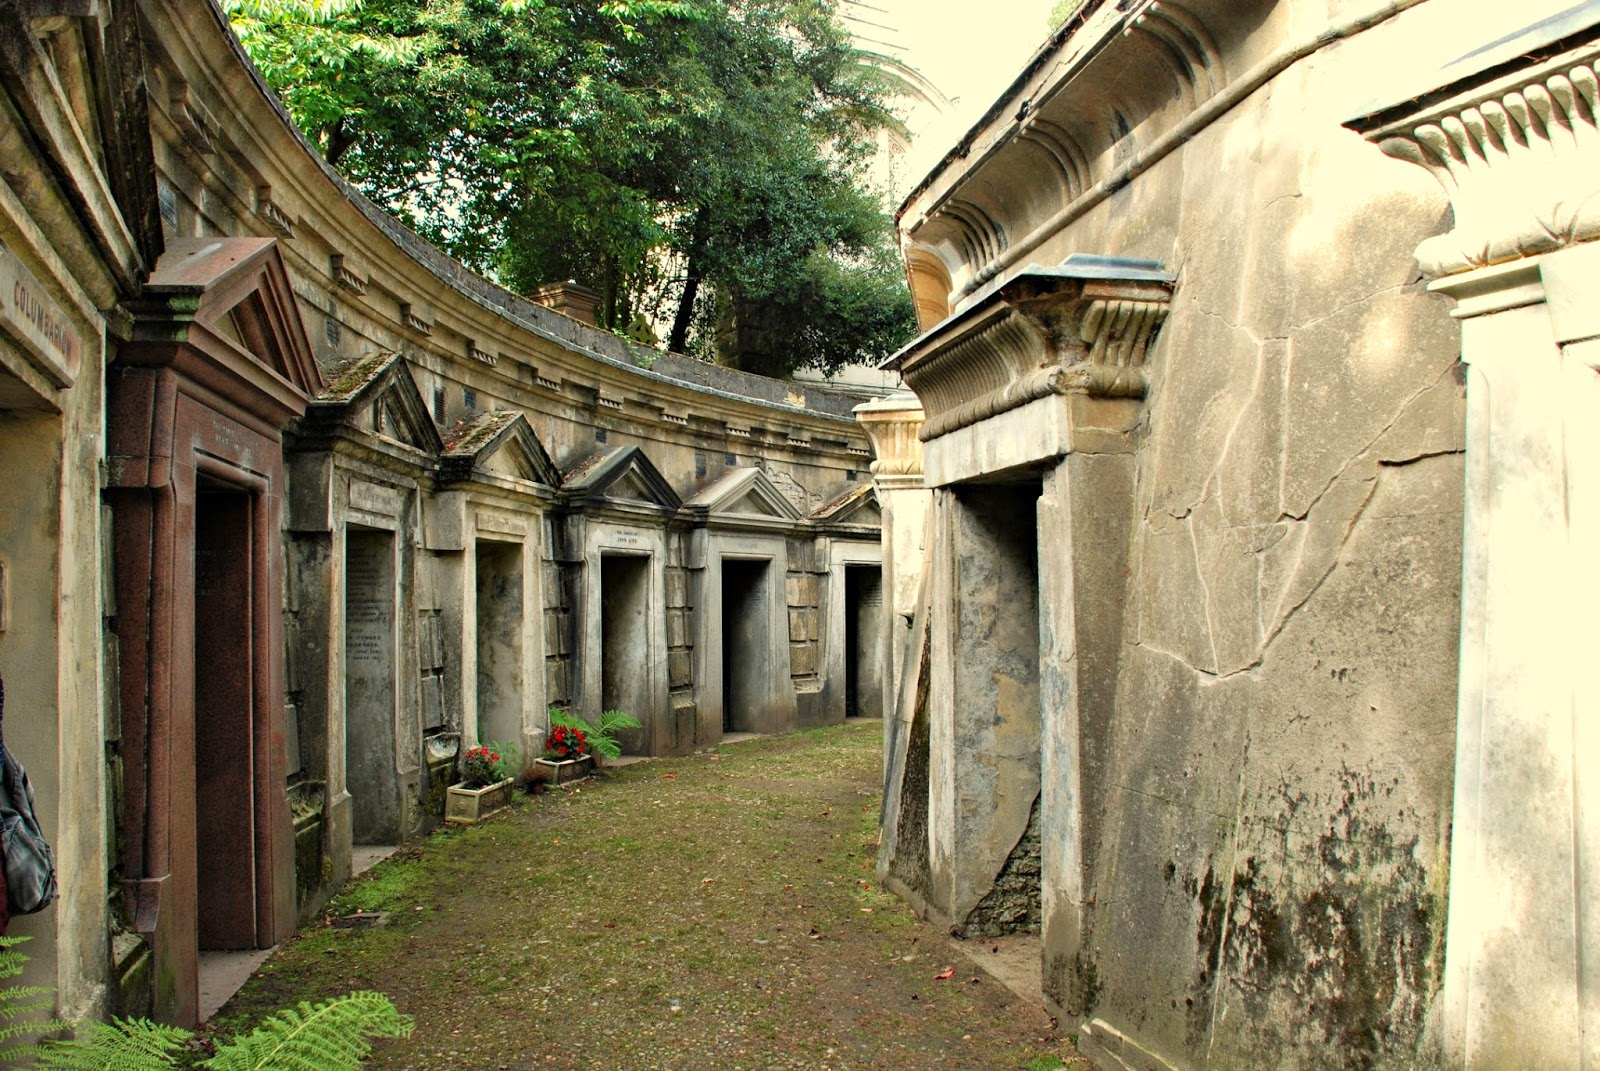 Just Saying ...: Highgate Cemetery ... An Autumnal Walk